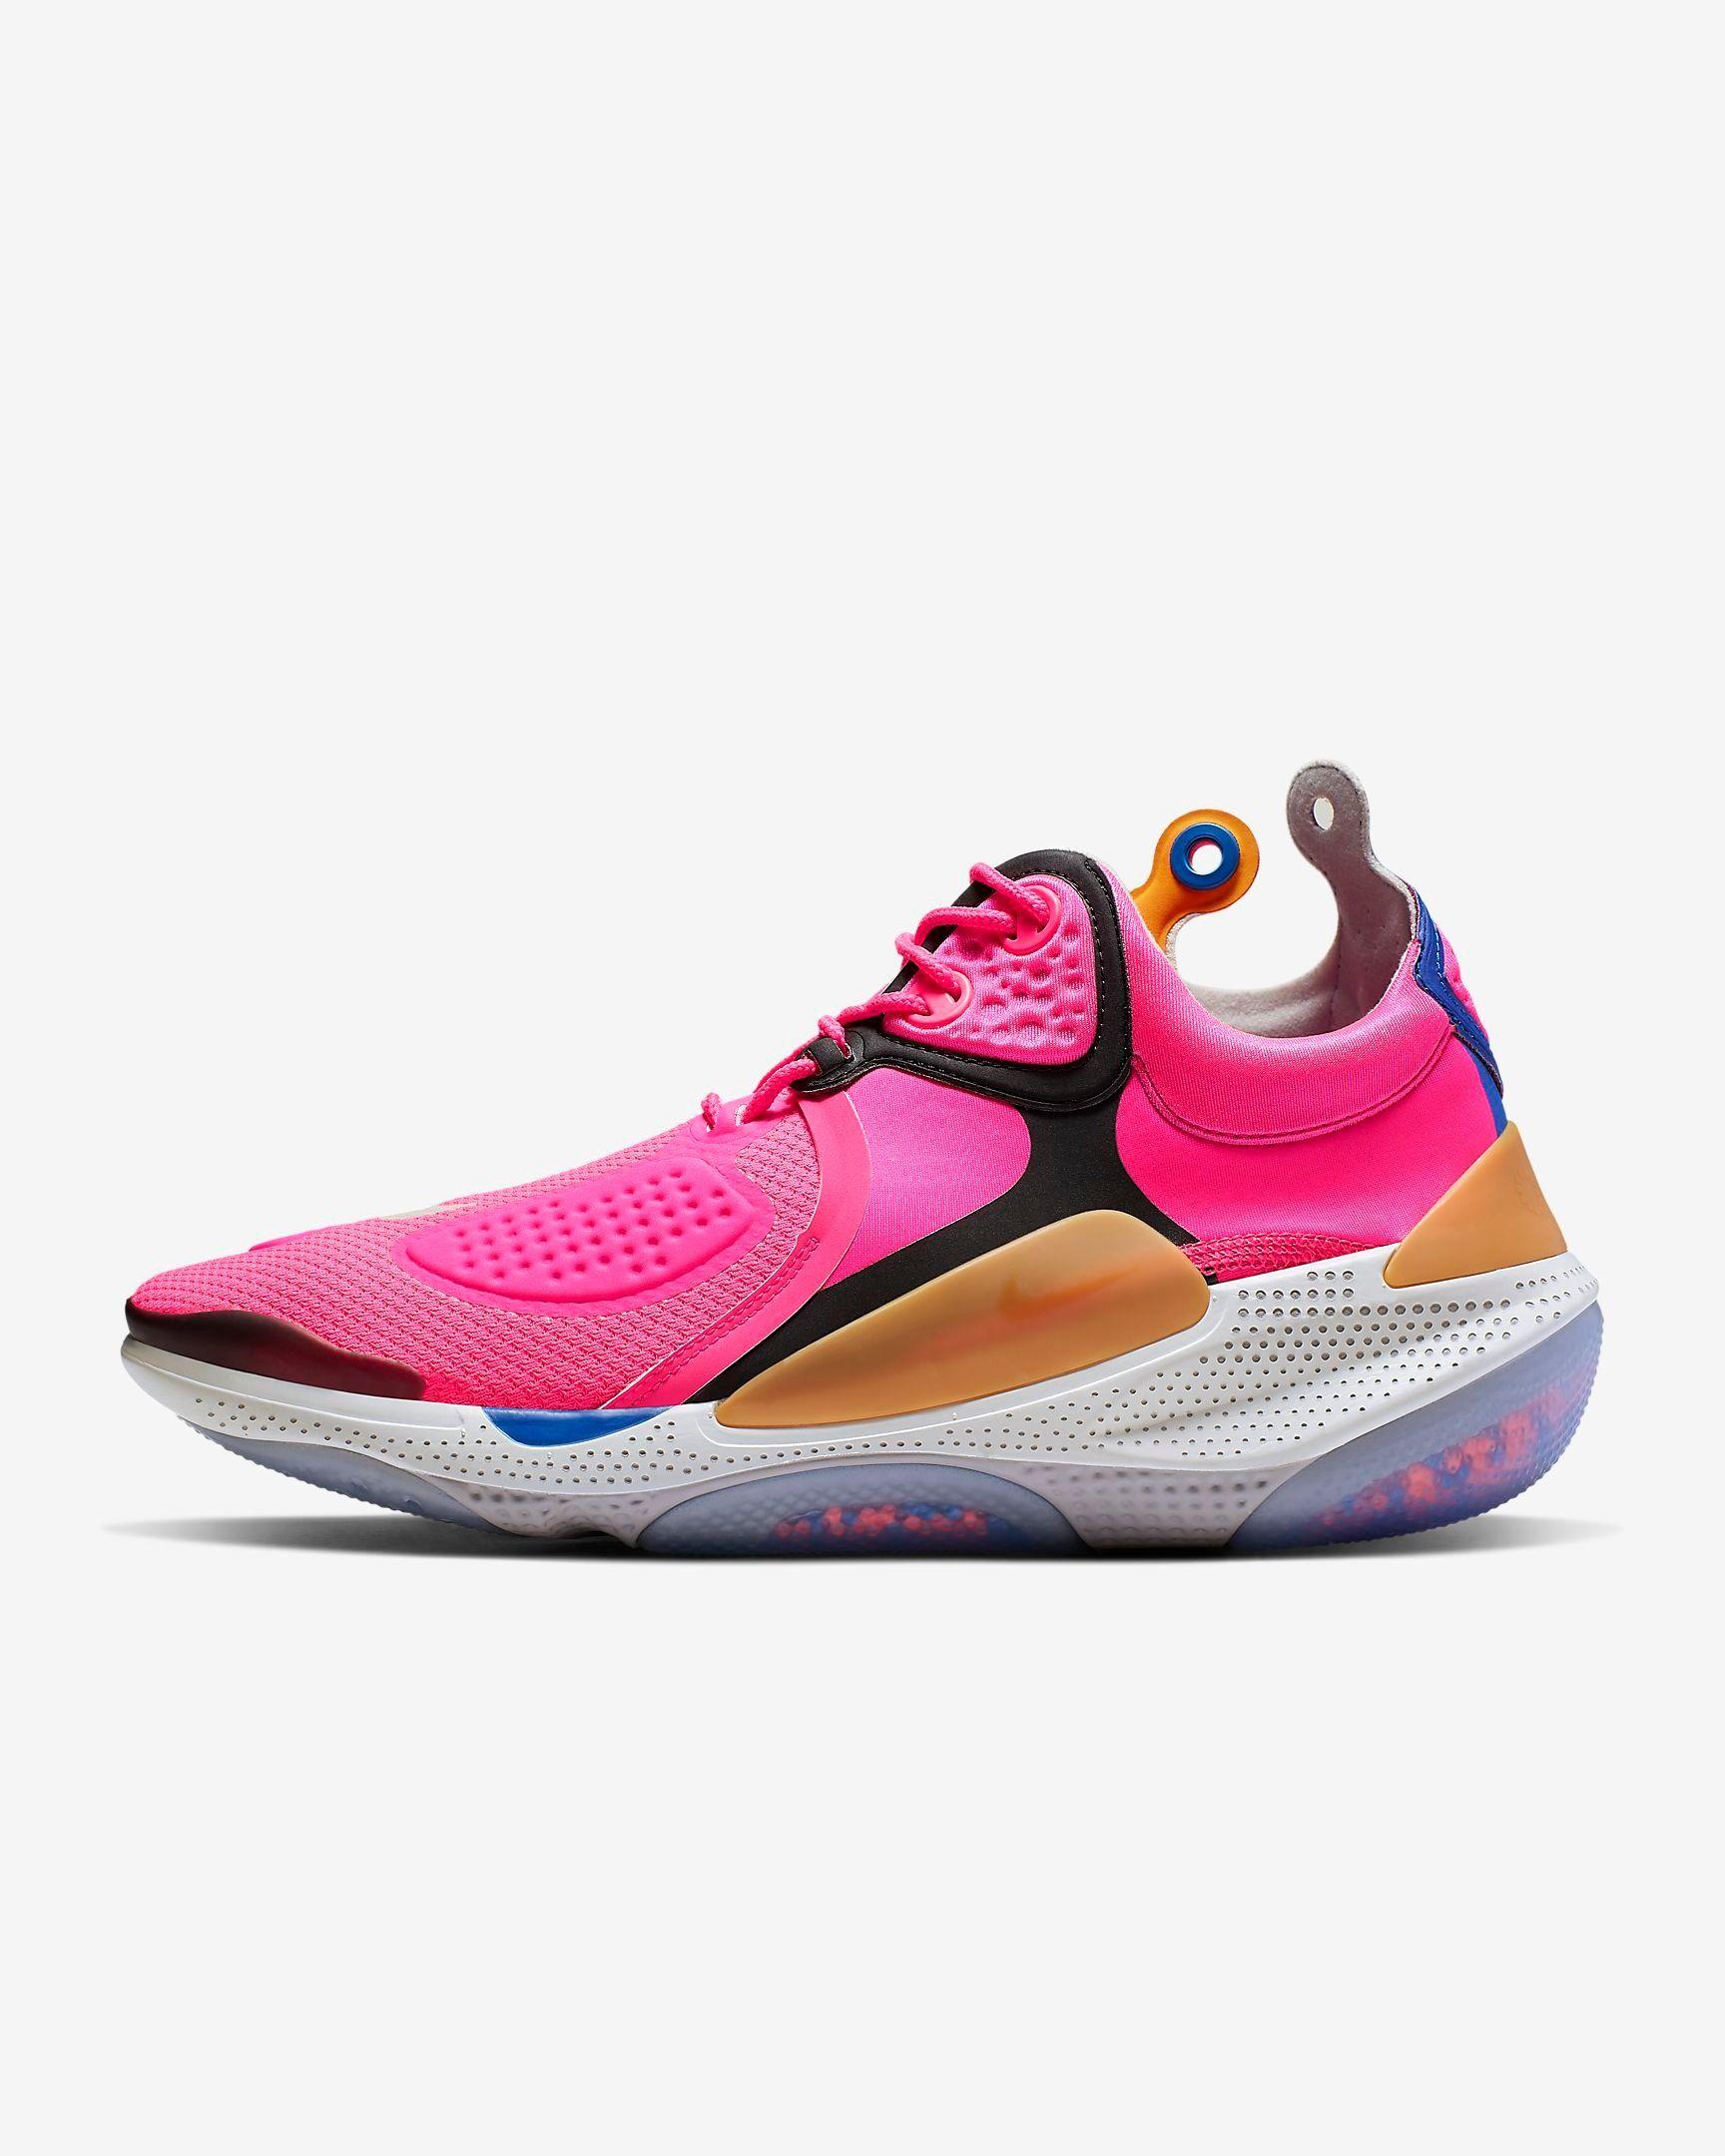 Reebok Men's Gusto Run Running Shoes